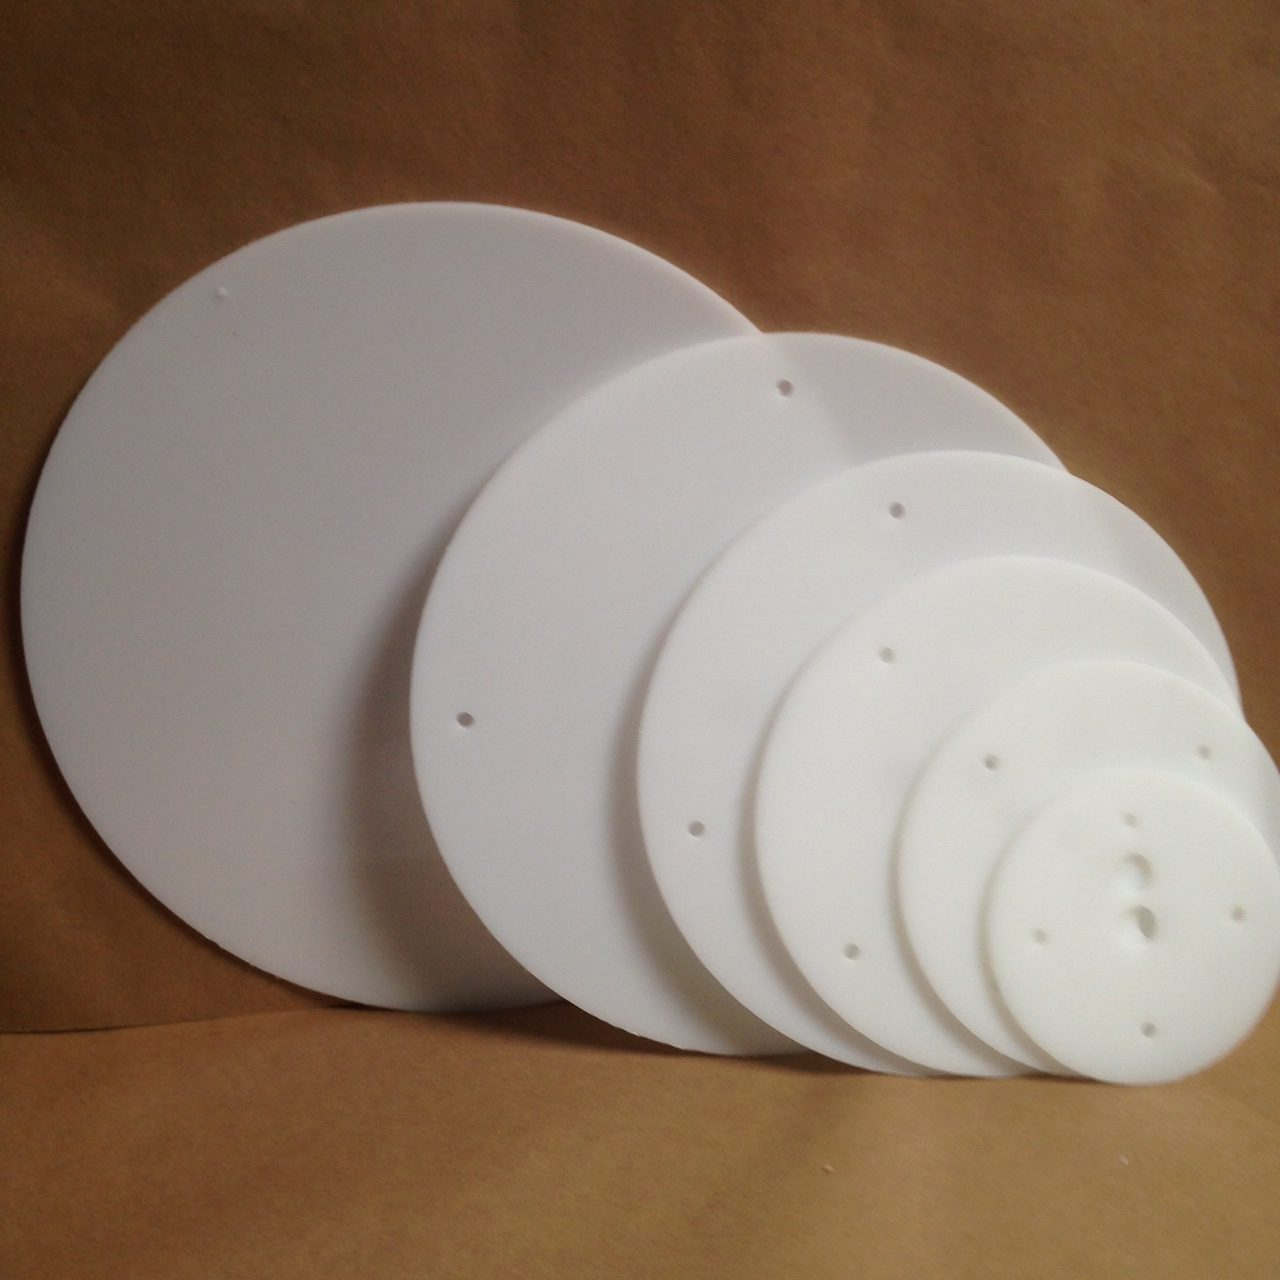 16-14-12-10-8-6 inch round plastic cake board set